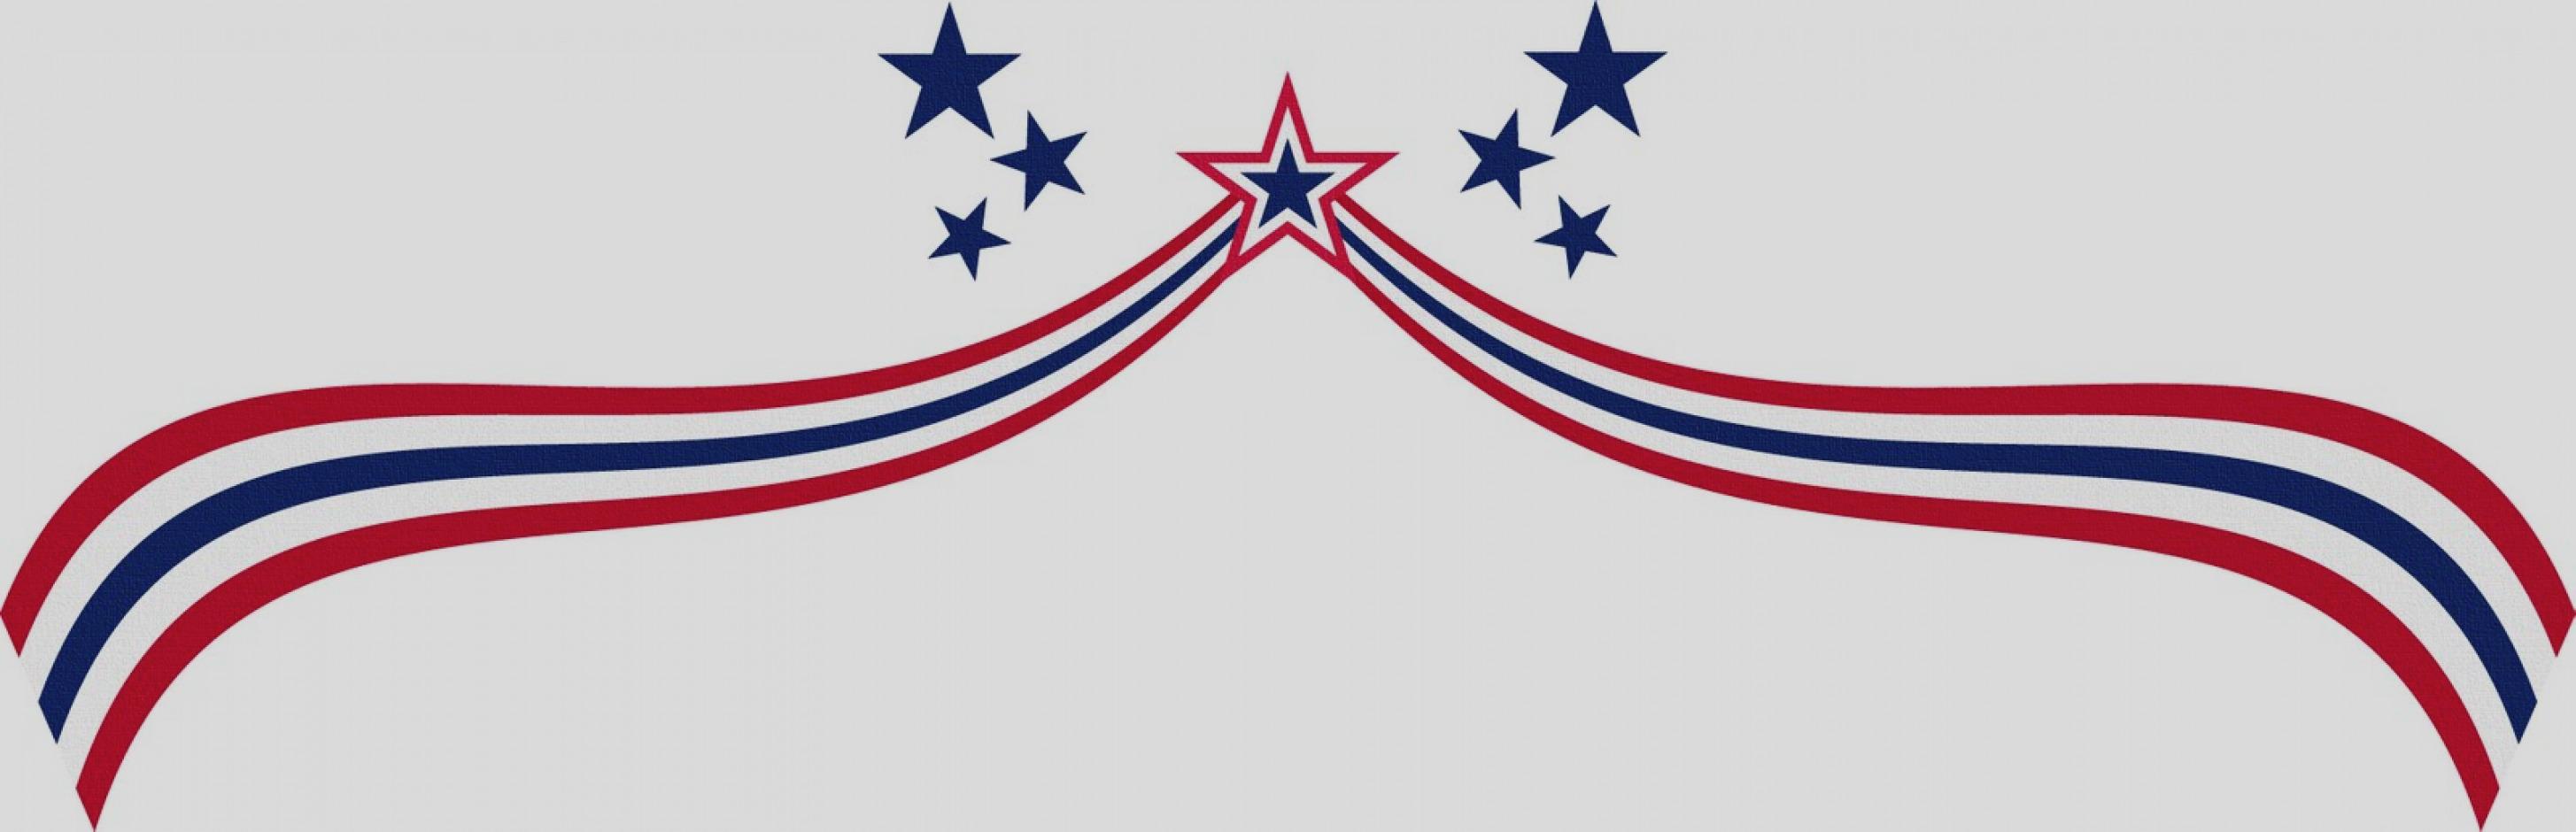 2909x940 4th Of July Flag Clip Art Free Printable